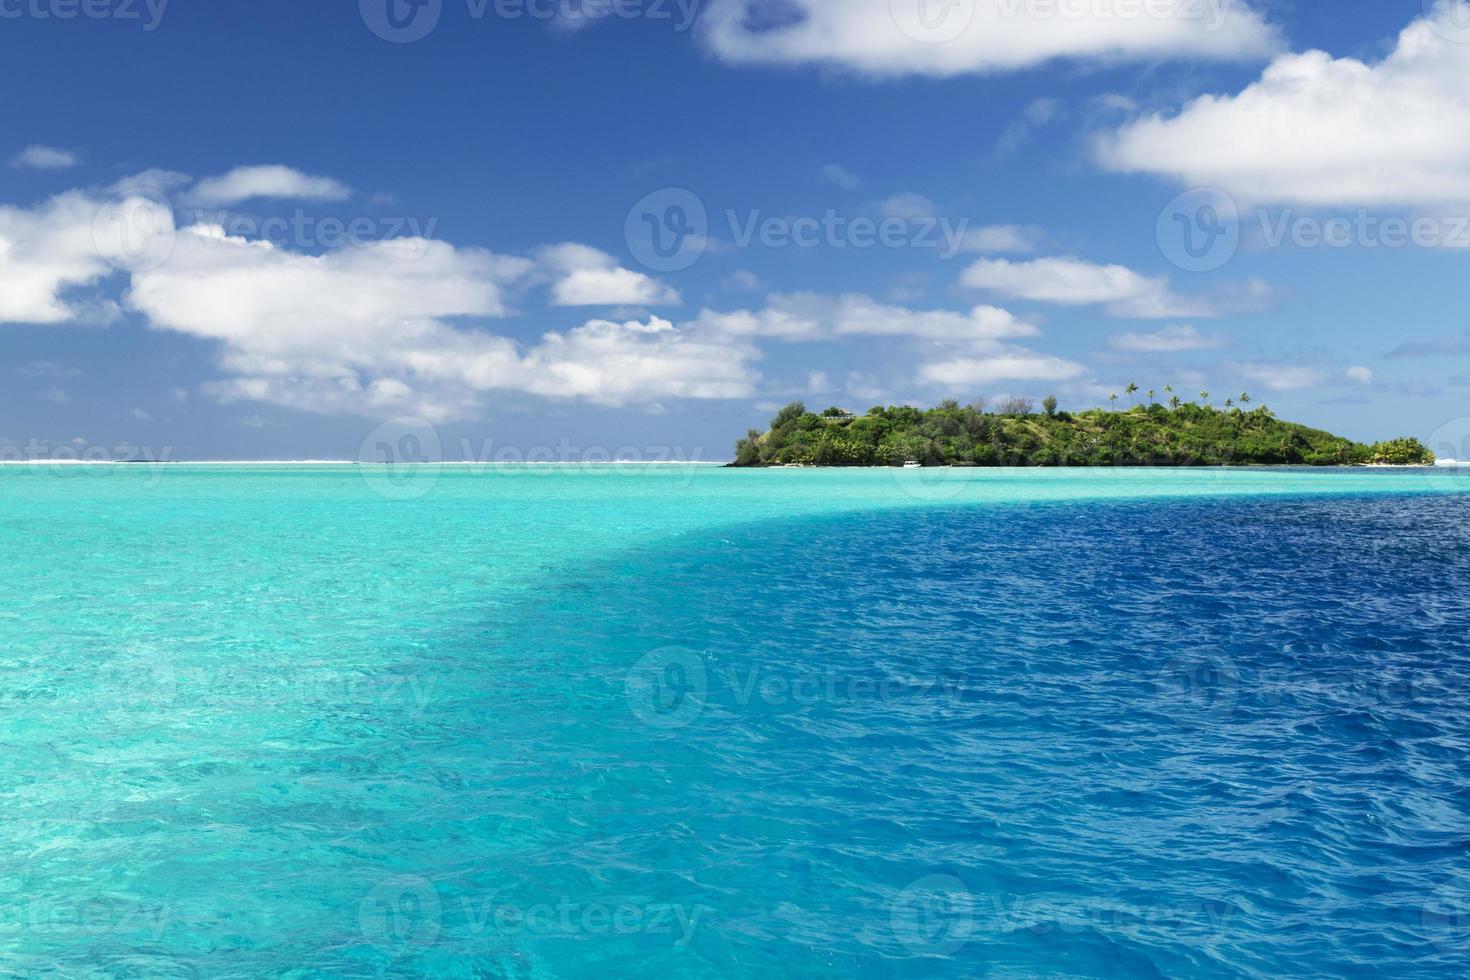 Bora Bora aqua and blue water photo